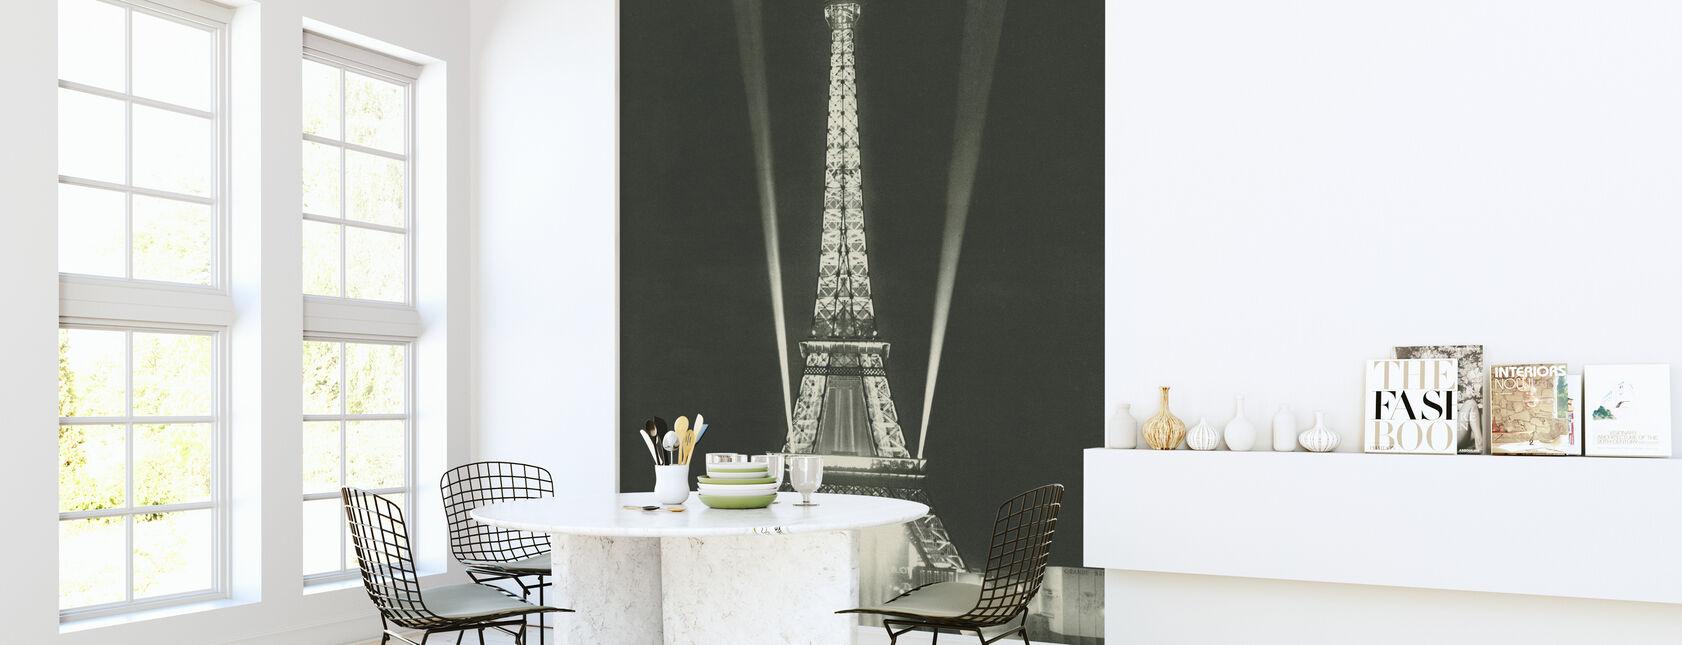 Eiffel Tower Lights - Wallpaper - Kitchen